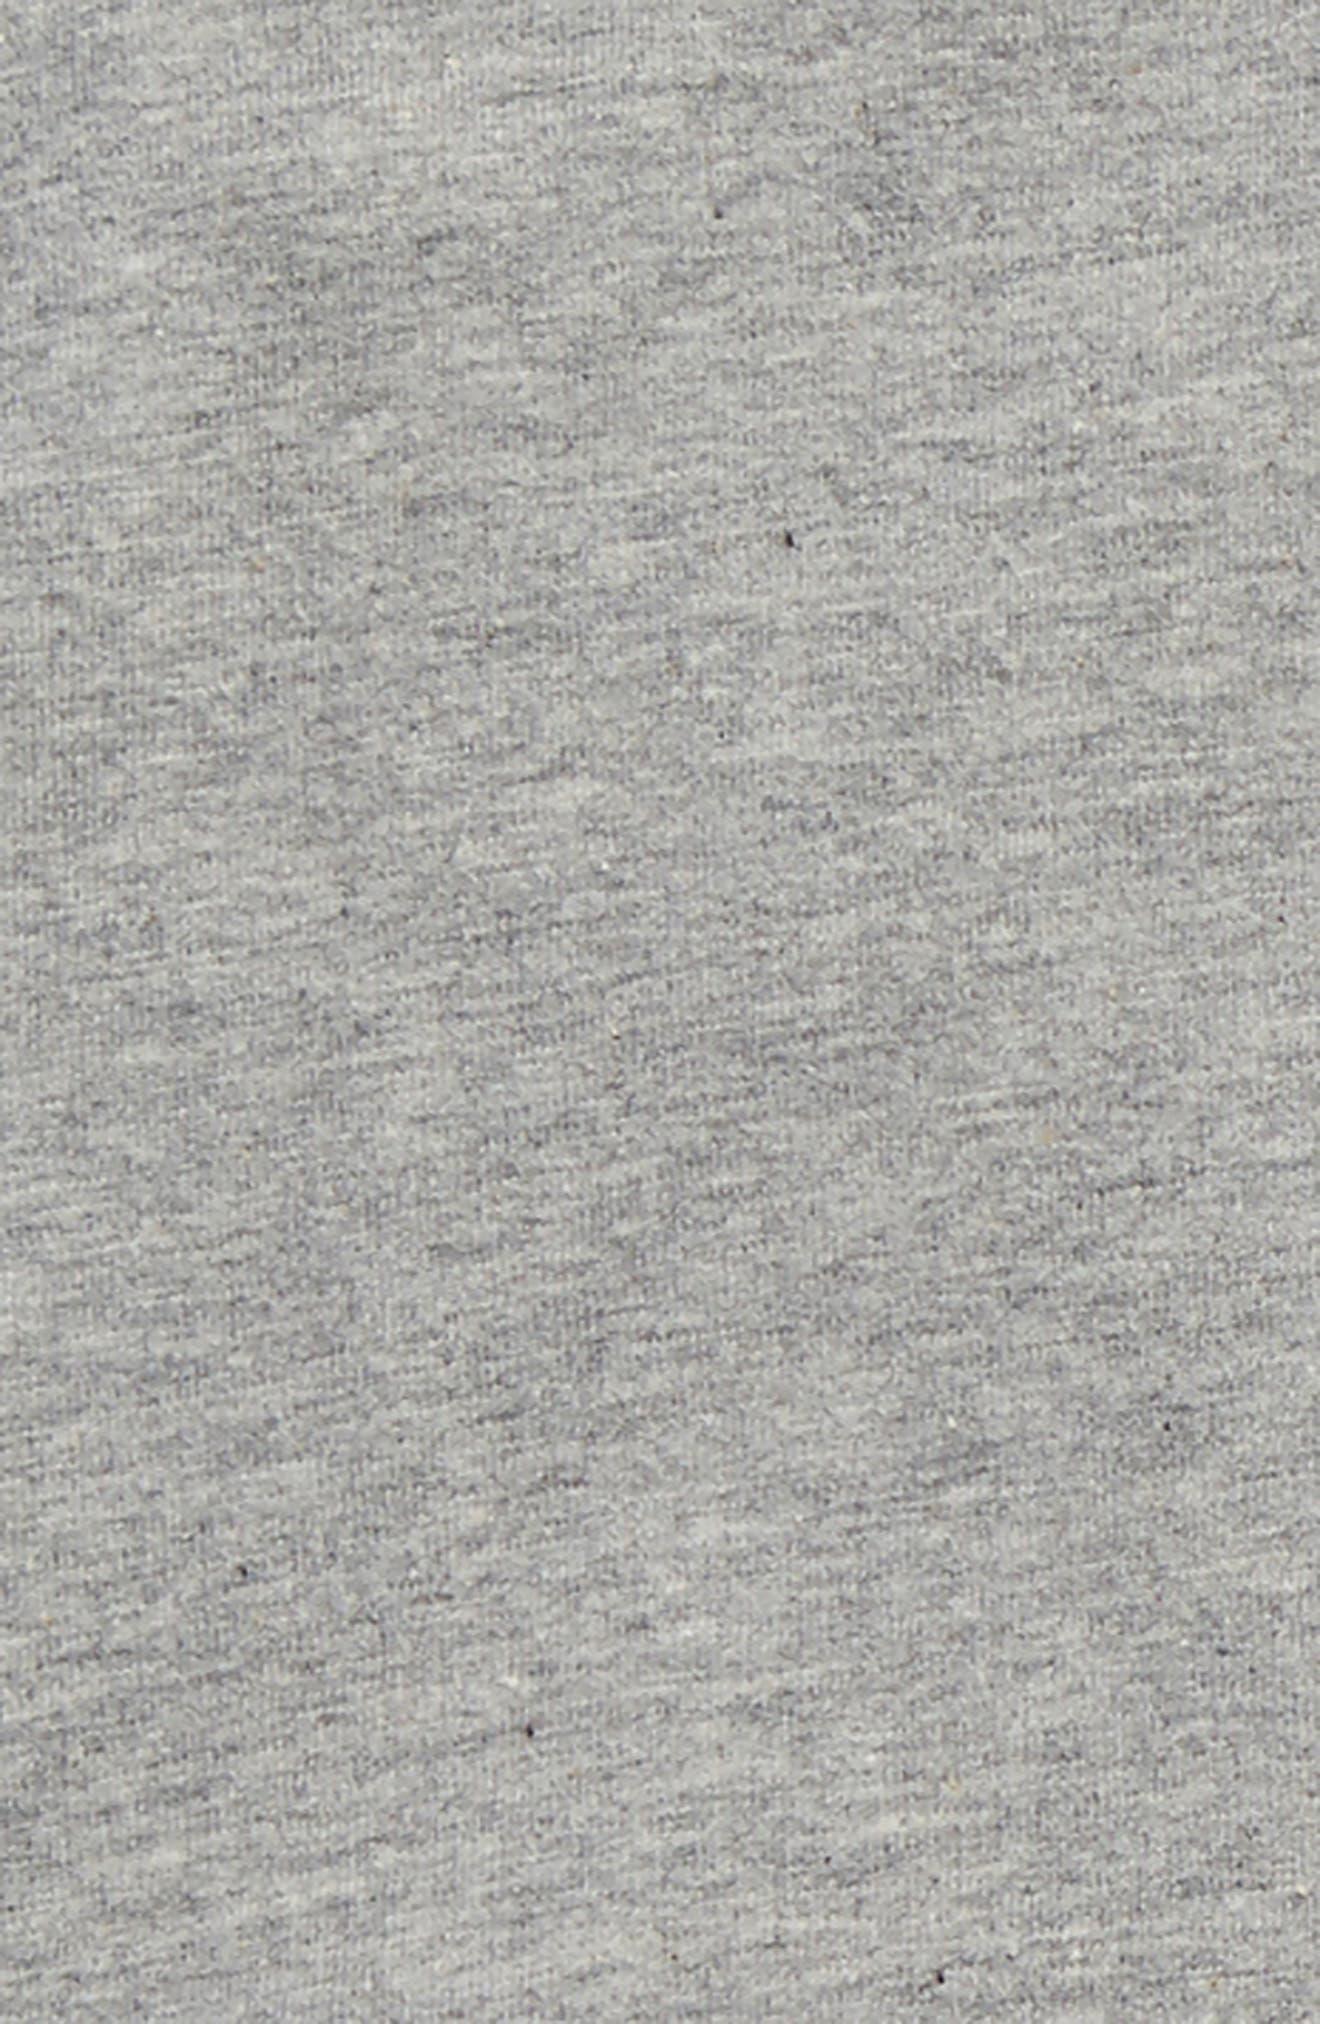 2-Pack Organic Cotton Blend Bike Shorts,                             Alternate thumbnail 2, color,                             020